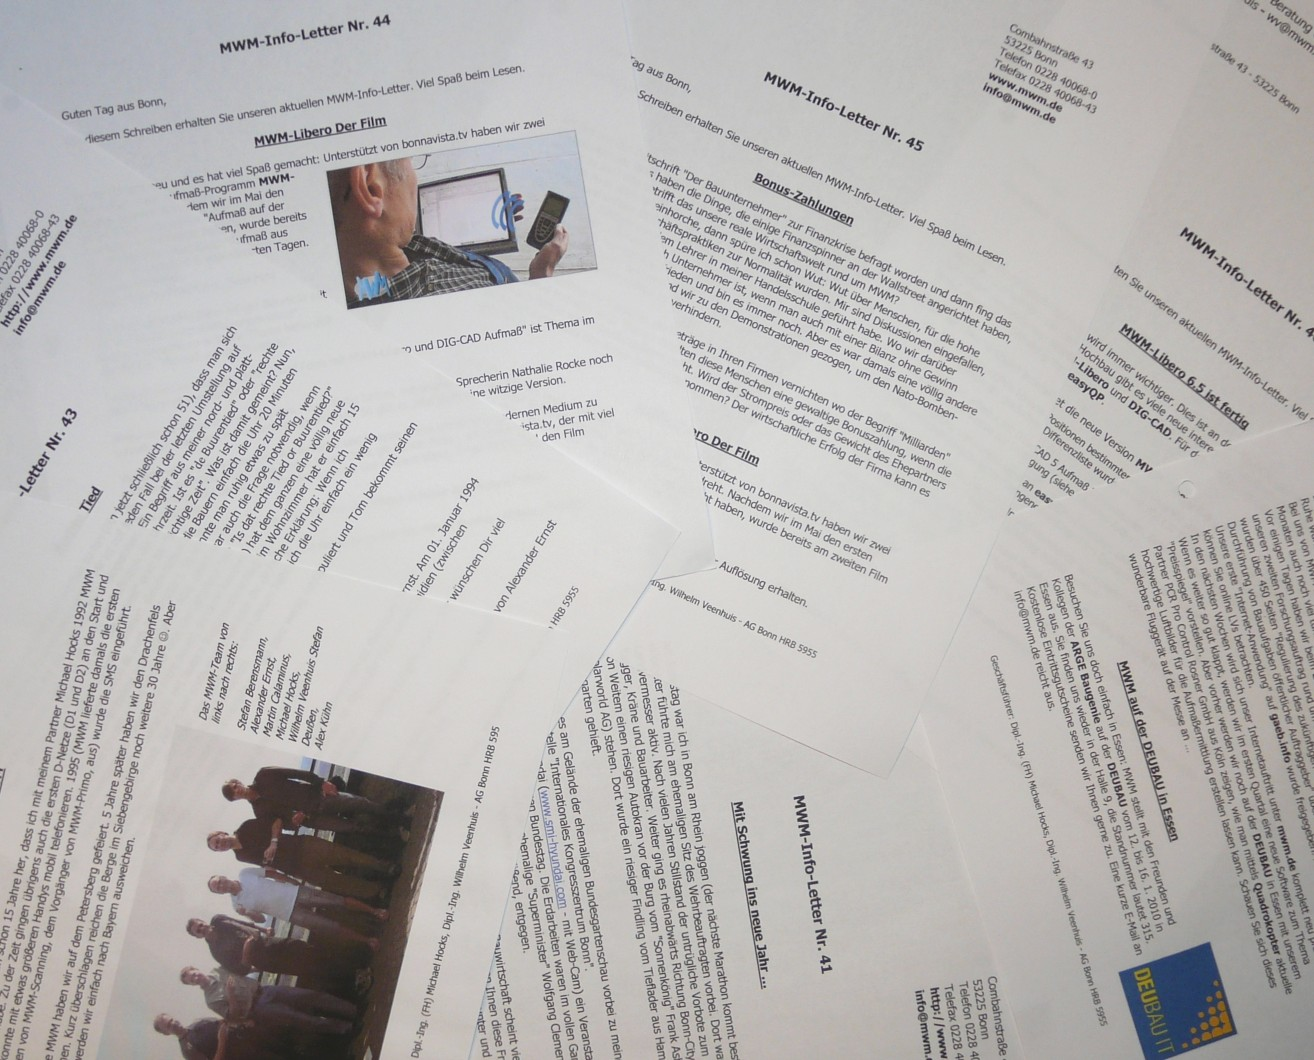 MWM-Info-Letter-Startbild